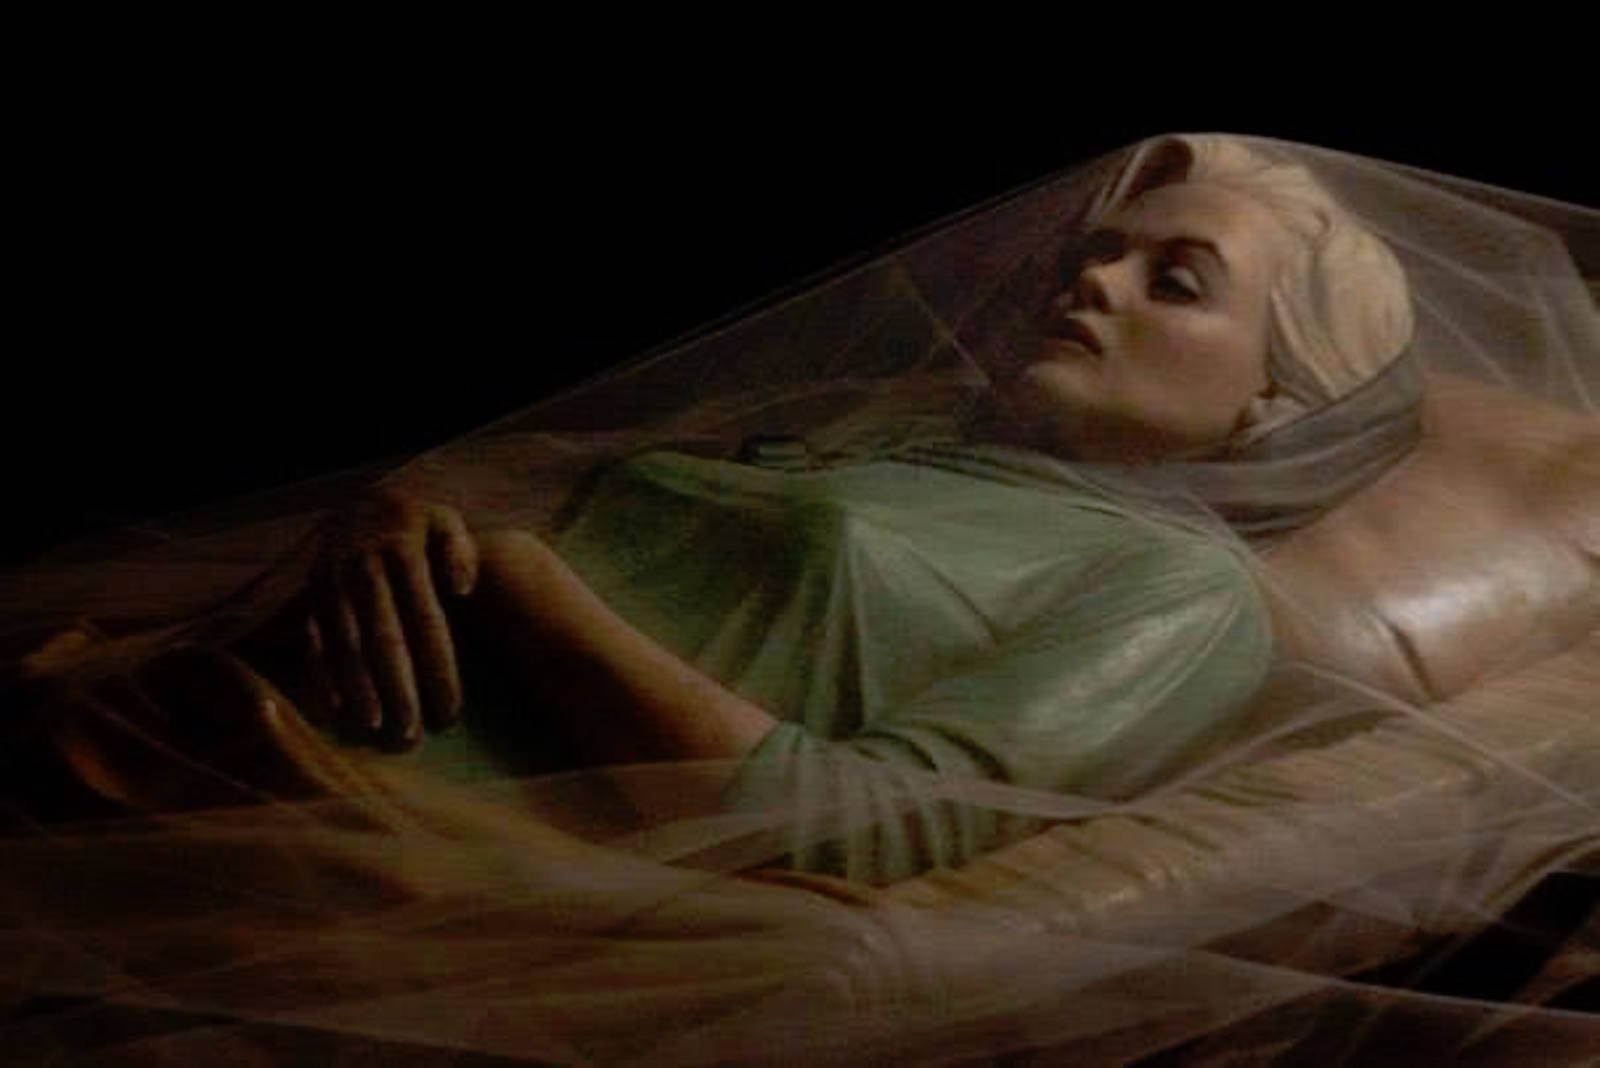 Marilyn Monroe: Early Victim of Opiod Epidemic HistoryNet Autopsy photo of marilyn monroe